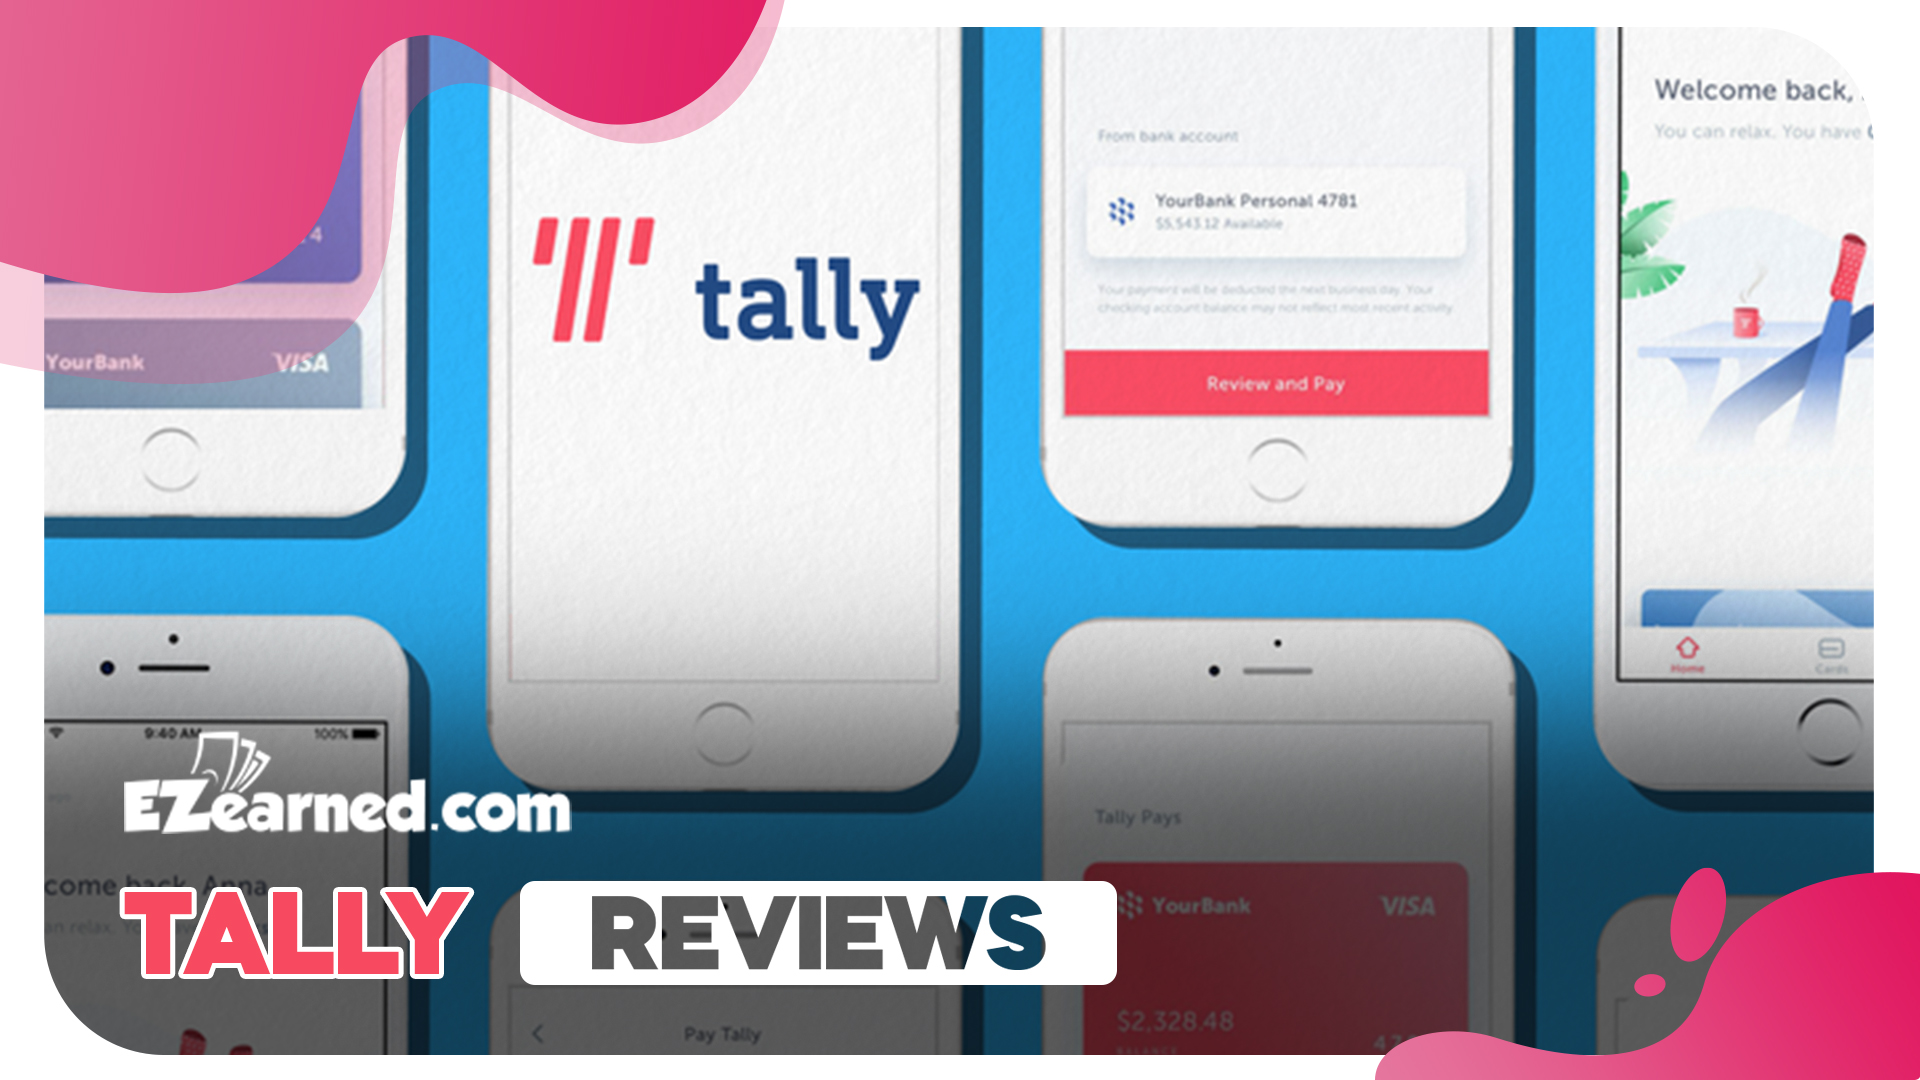 tally reviews